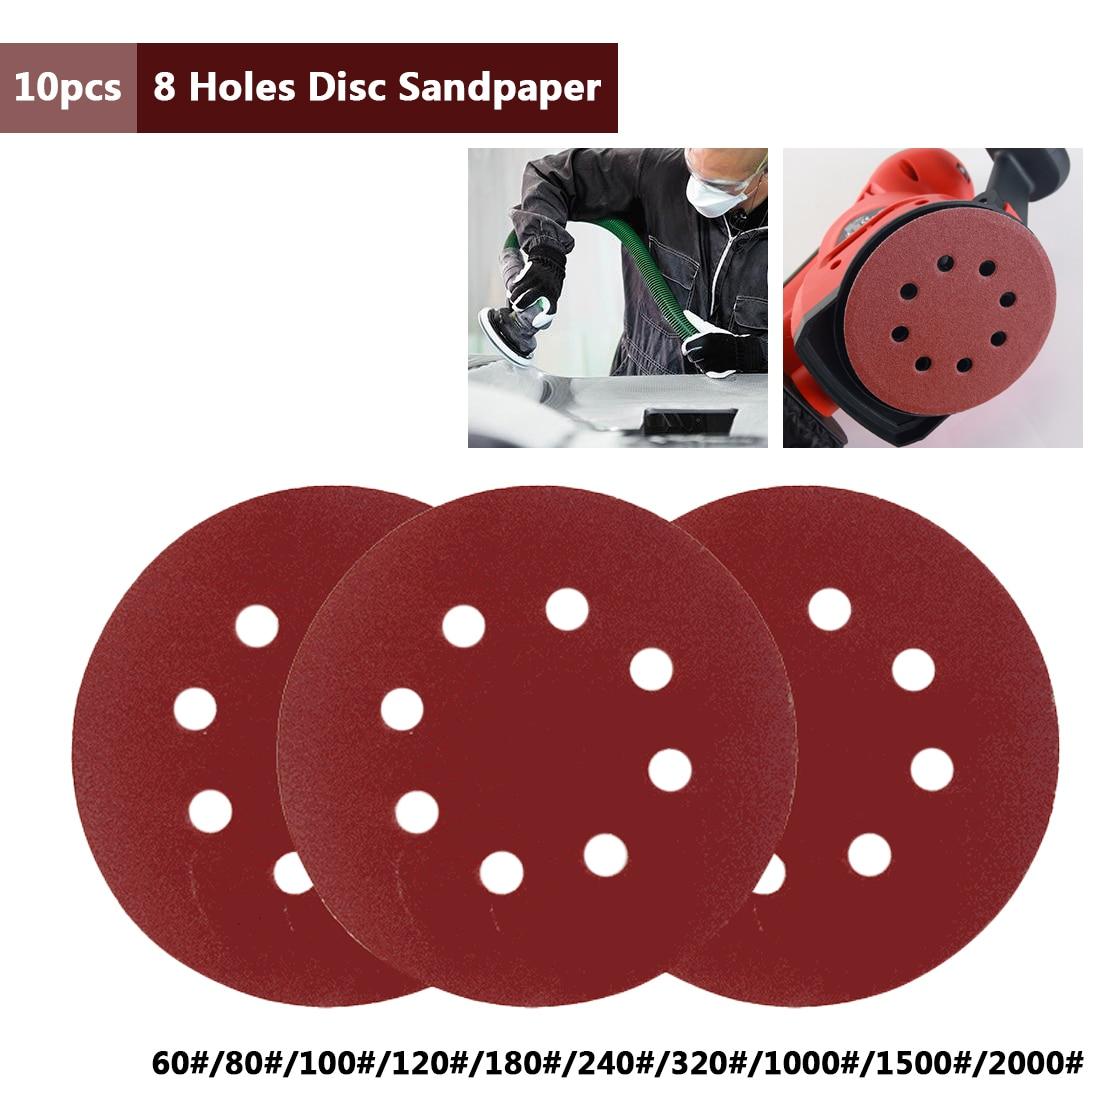 10pcs 125mm/5'' Sanding Polishing Sheet Sandpaper Round Shape Sander Discs  60-2000 Grit Polish Pad